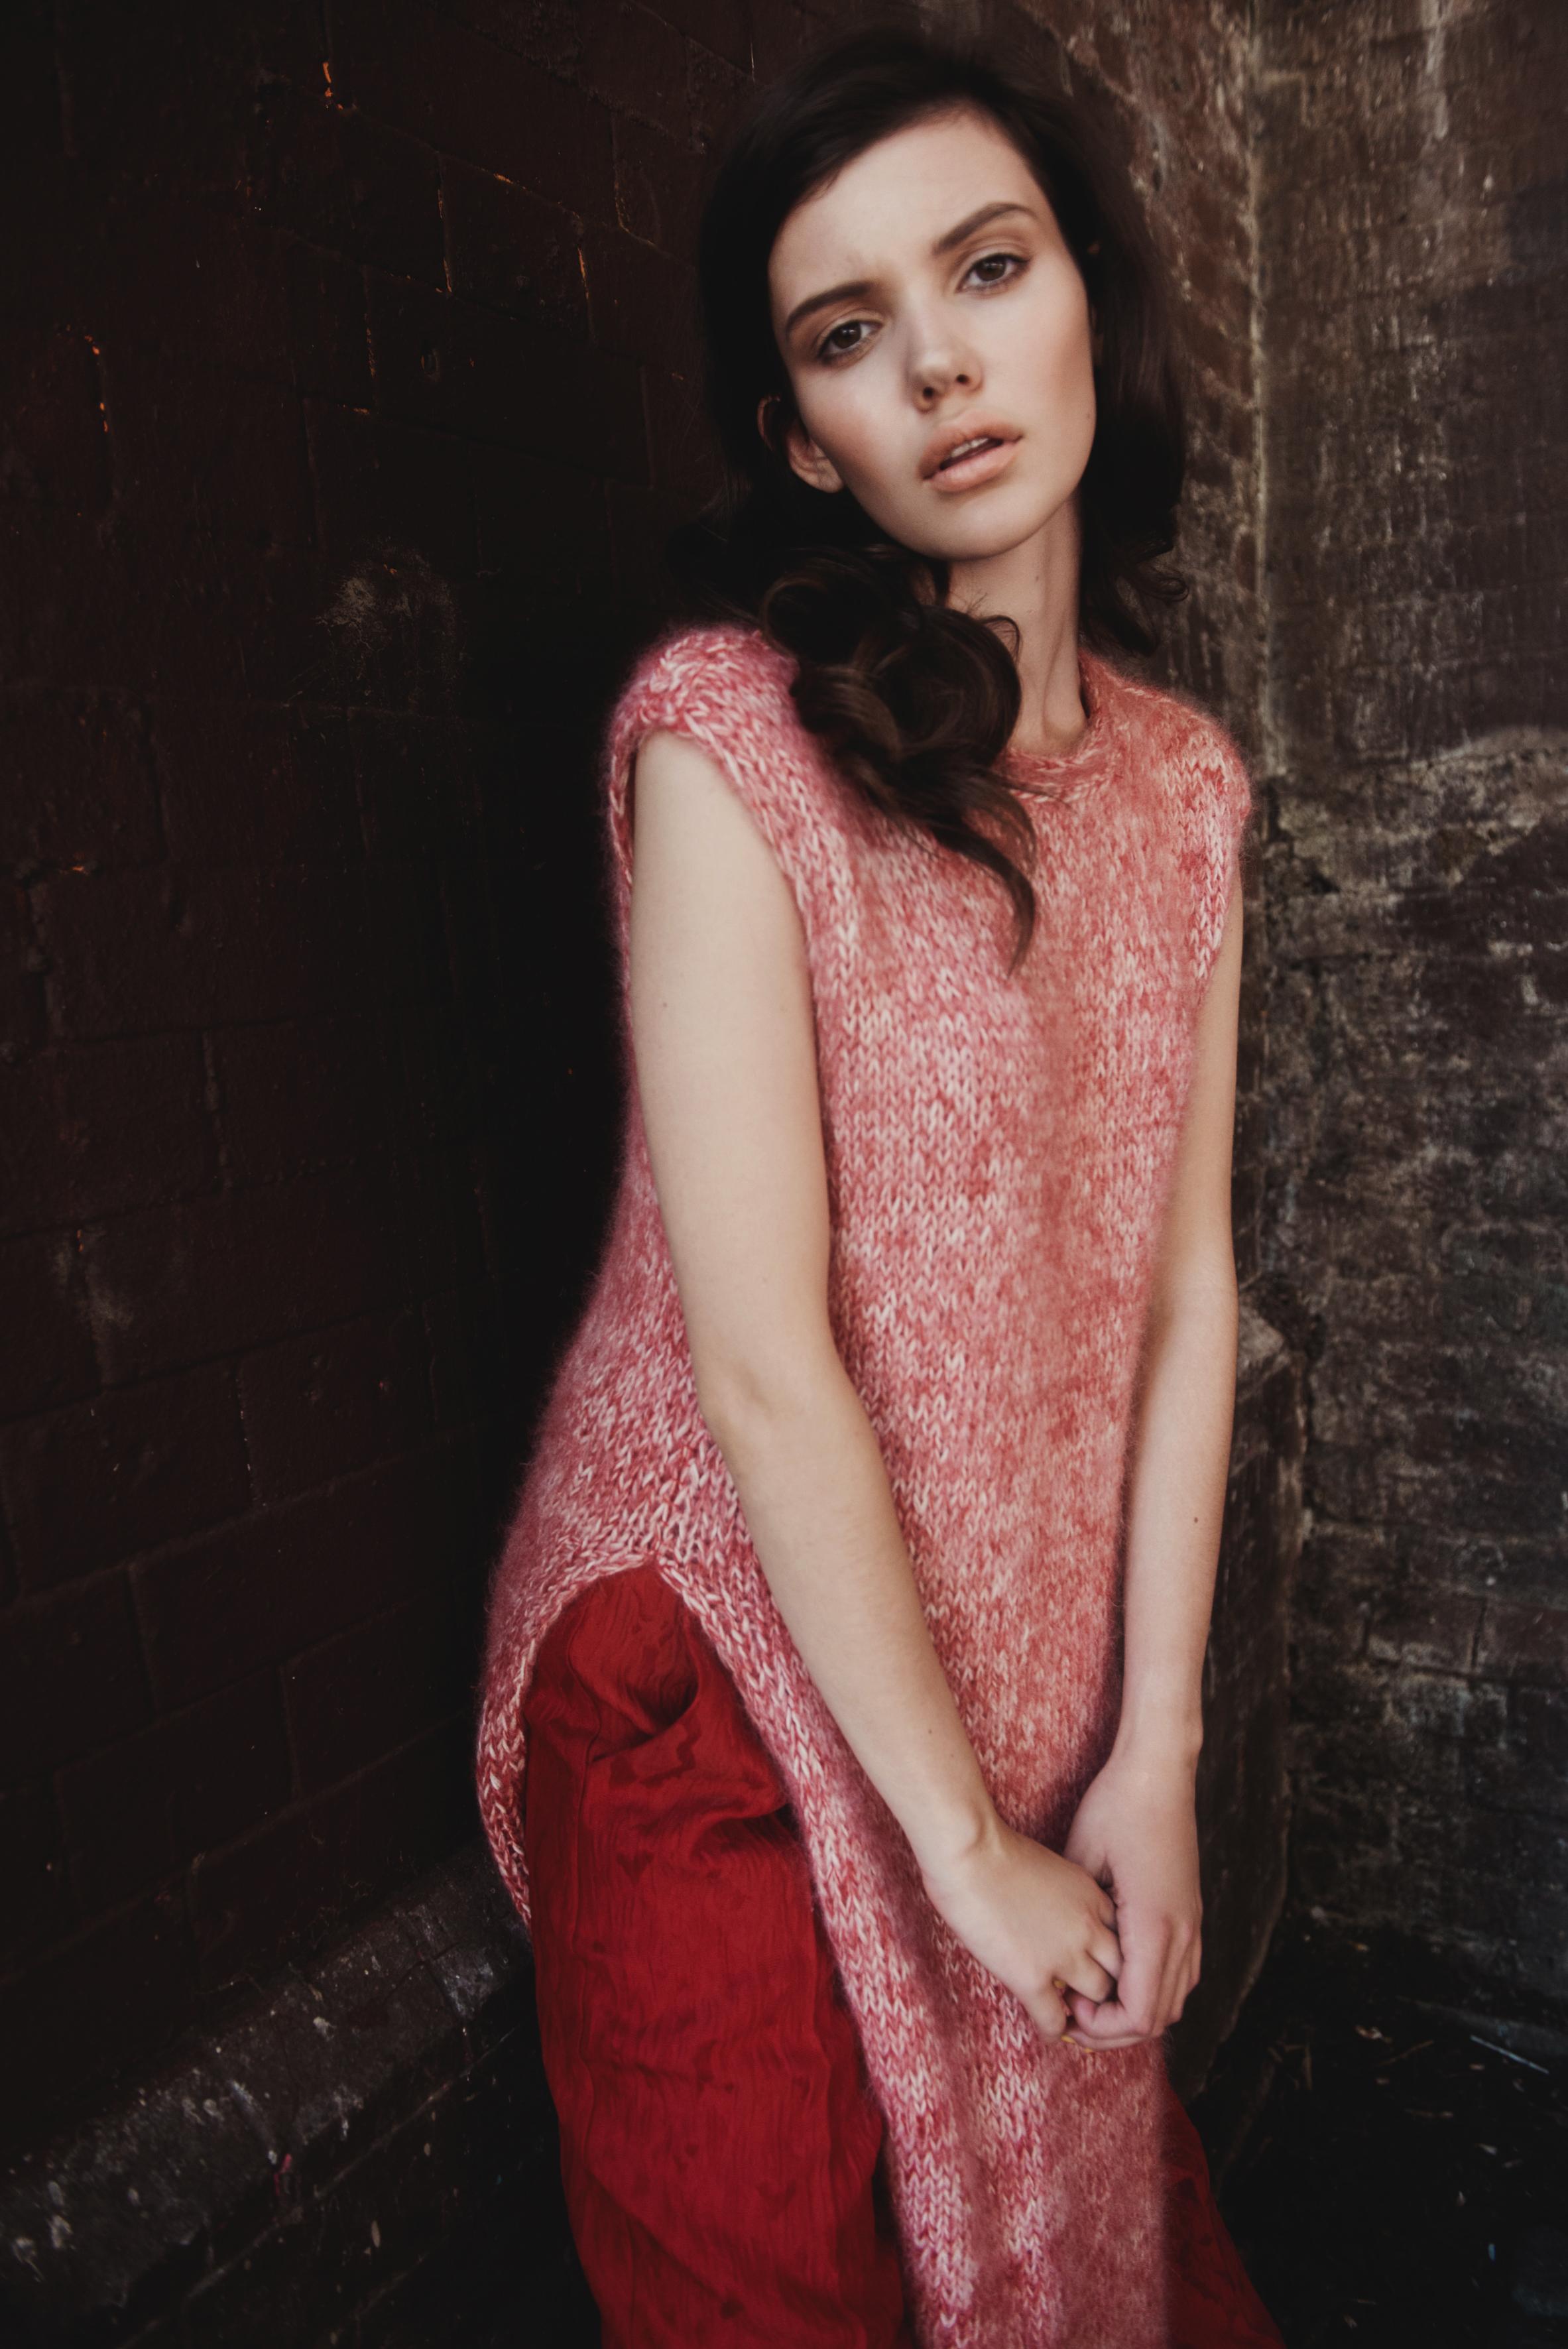 sasha-oneill-make-up-artist_solstice -magazine_east-of-eden_5